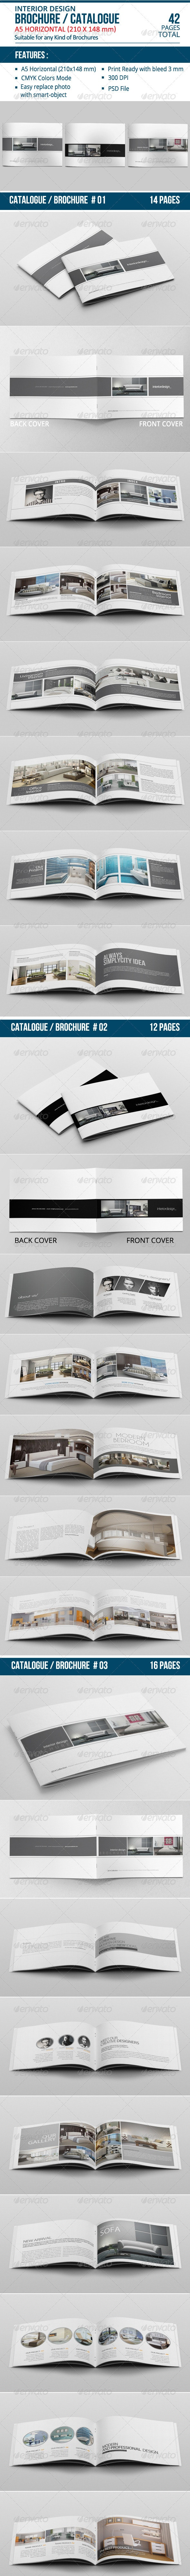 Catalogue / Brochure Bundle Vol. 02 - Catalogs Brochures